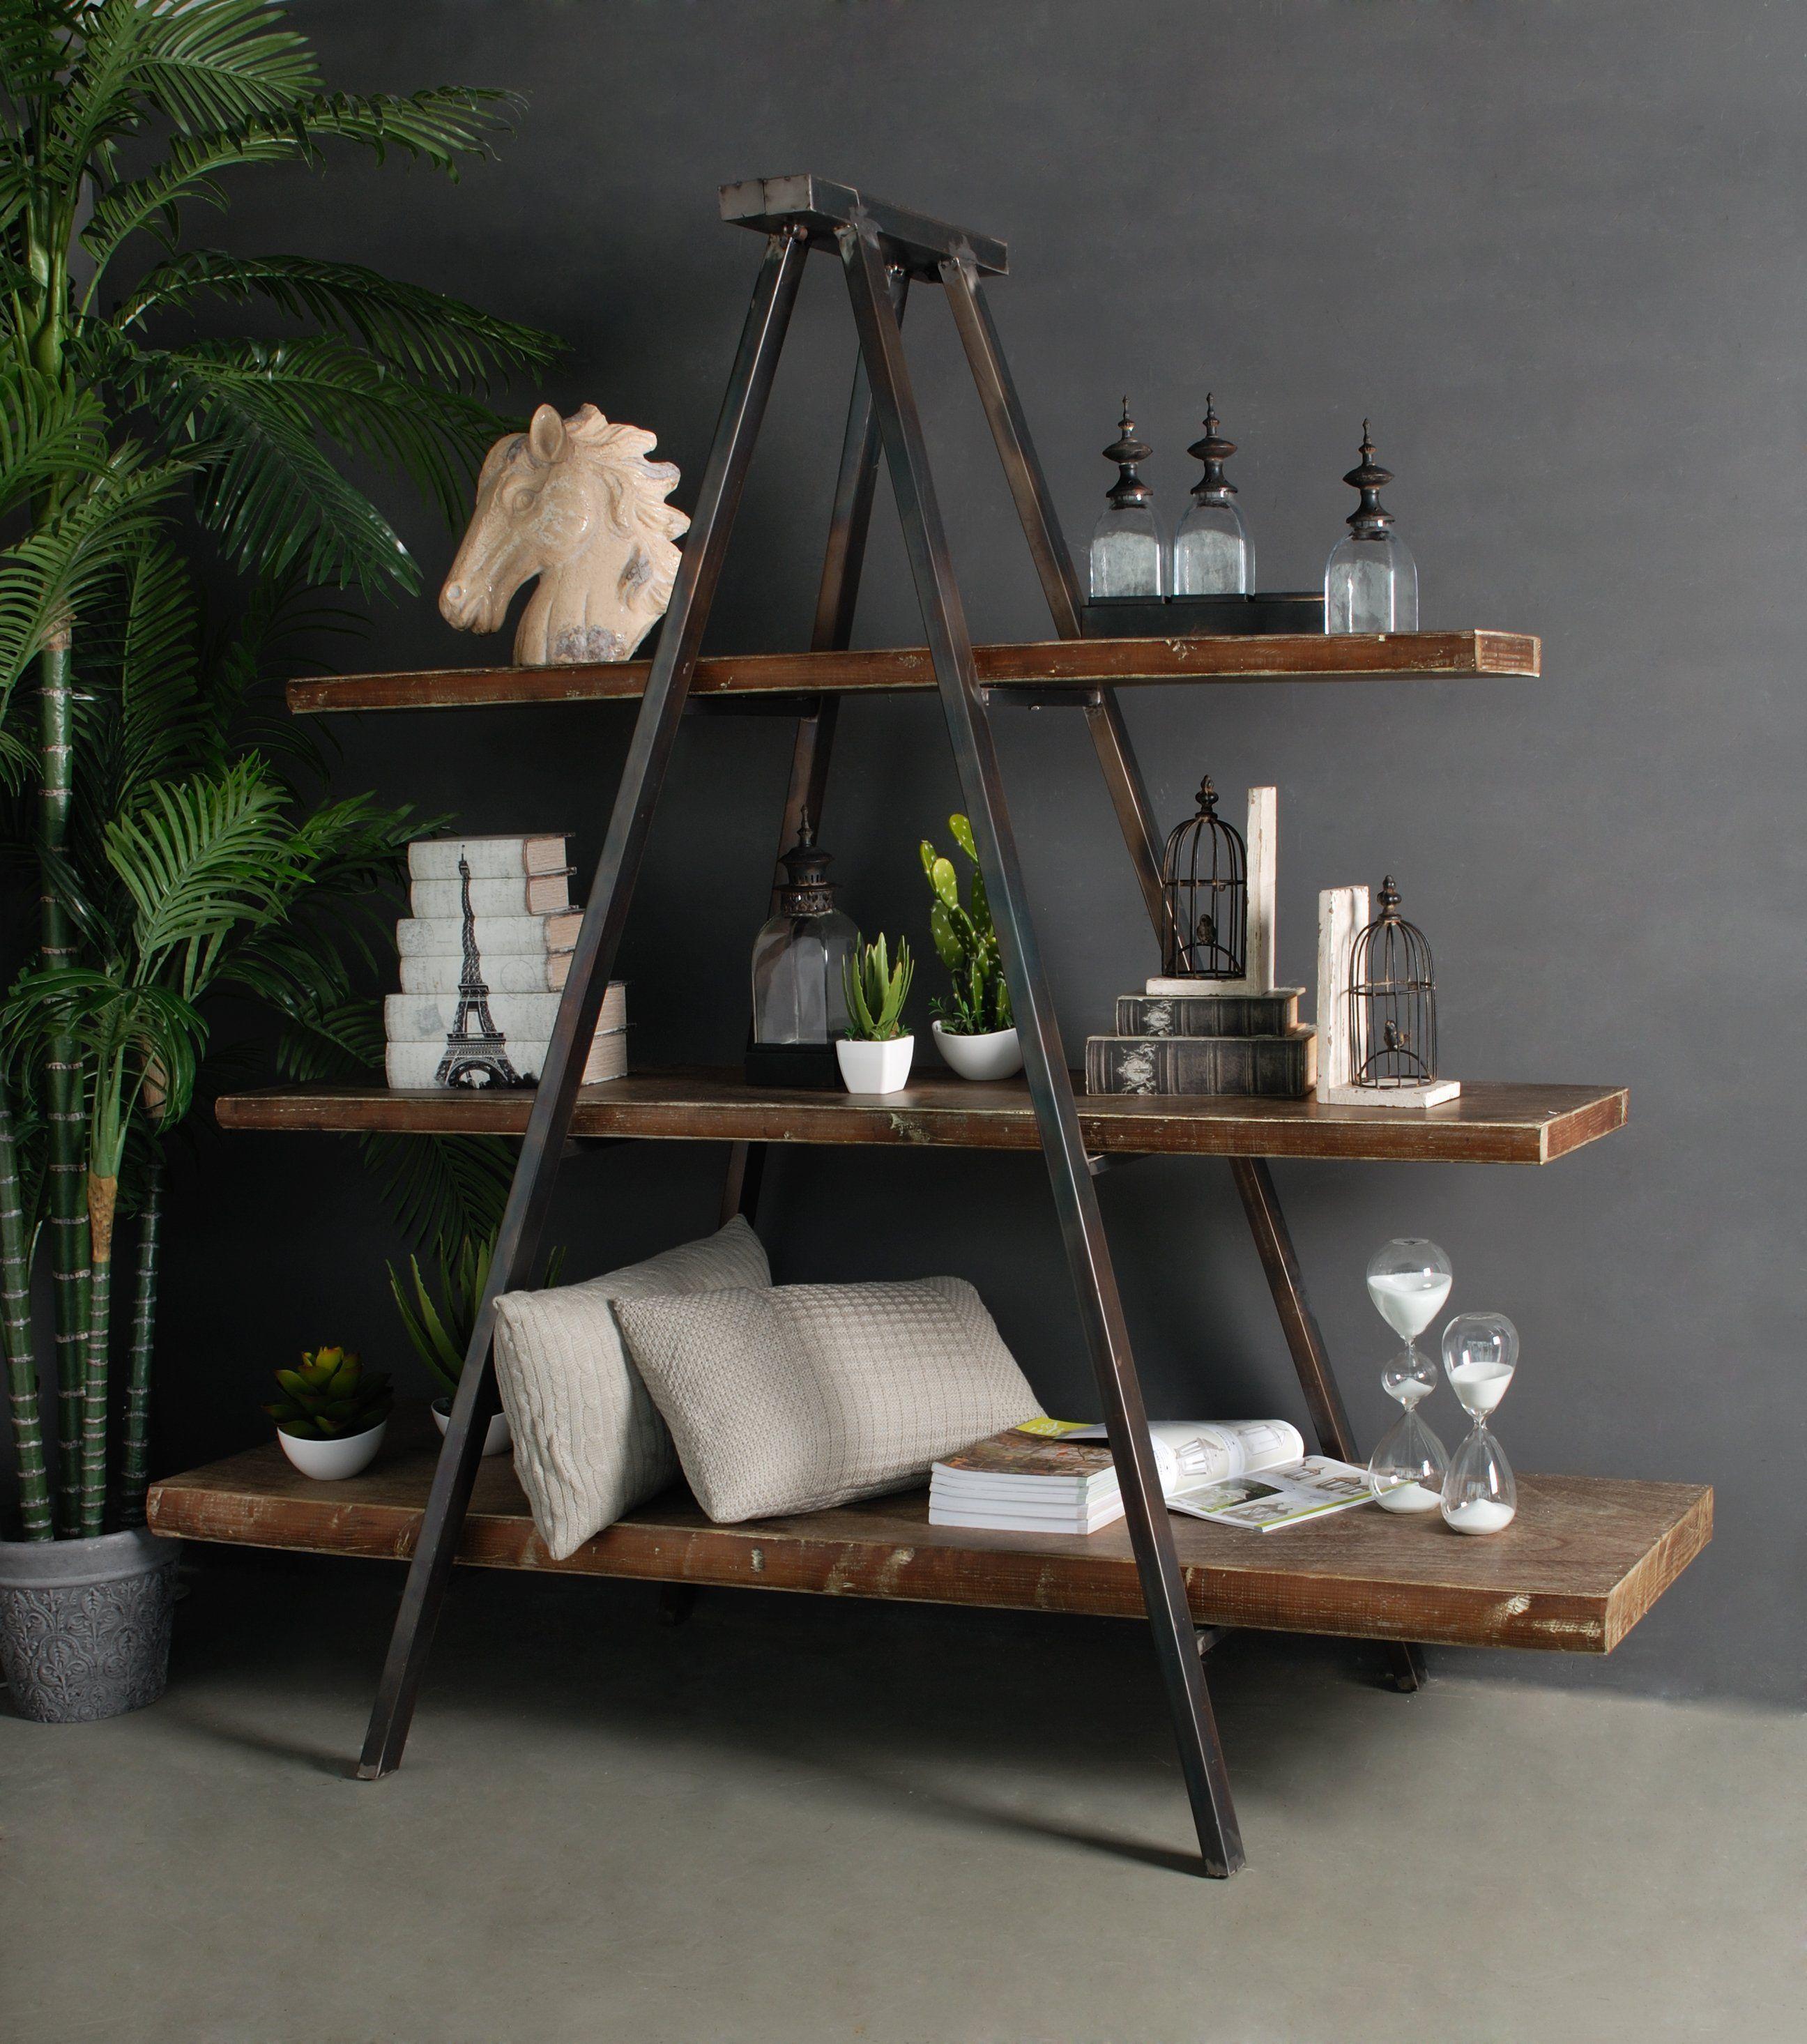 Haus vorderseite seitenwand design  stupefying useful ideas attic lighting apartment therapy attic